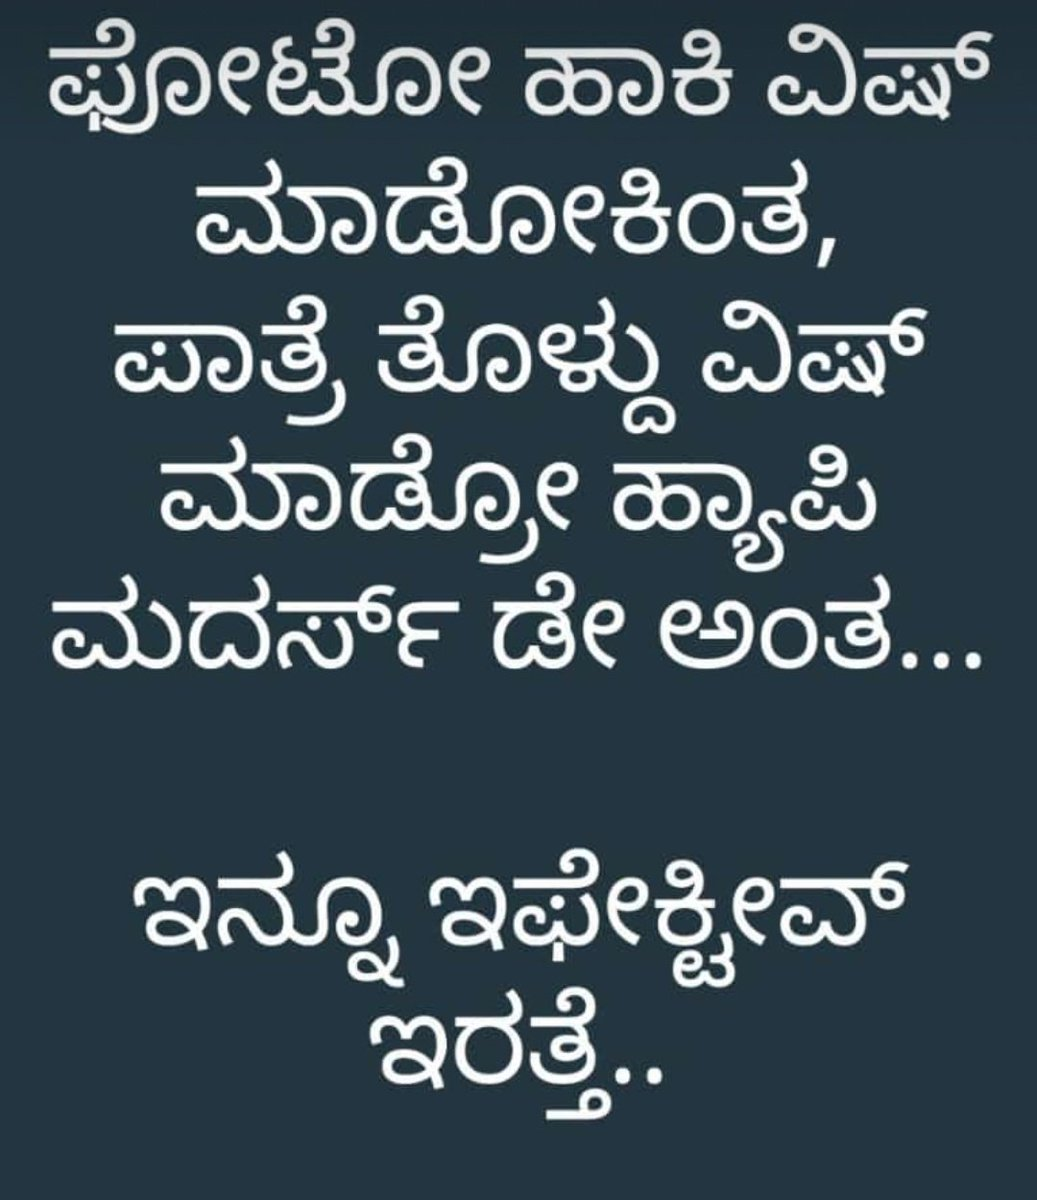 8763a79a1bd Chowkidar Prashanth Balla ( prashanthballa)